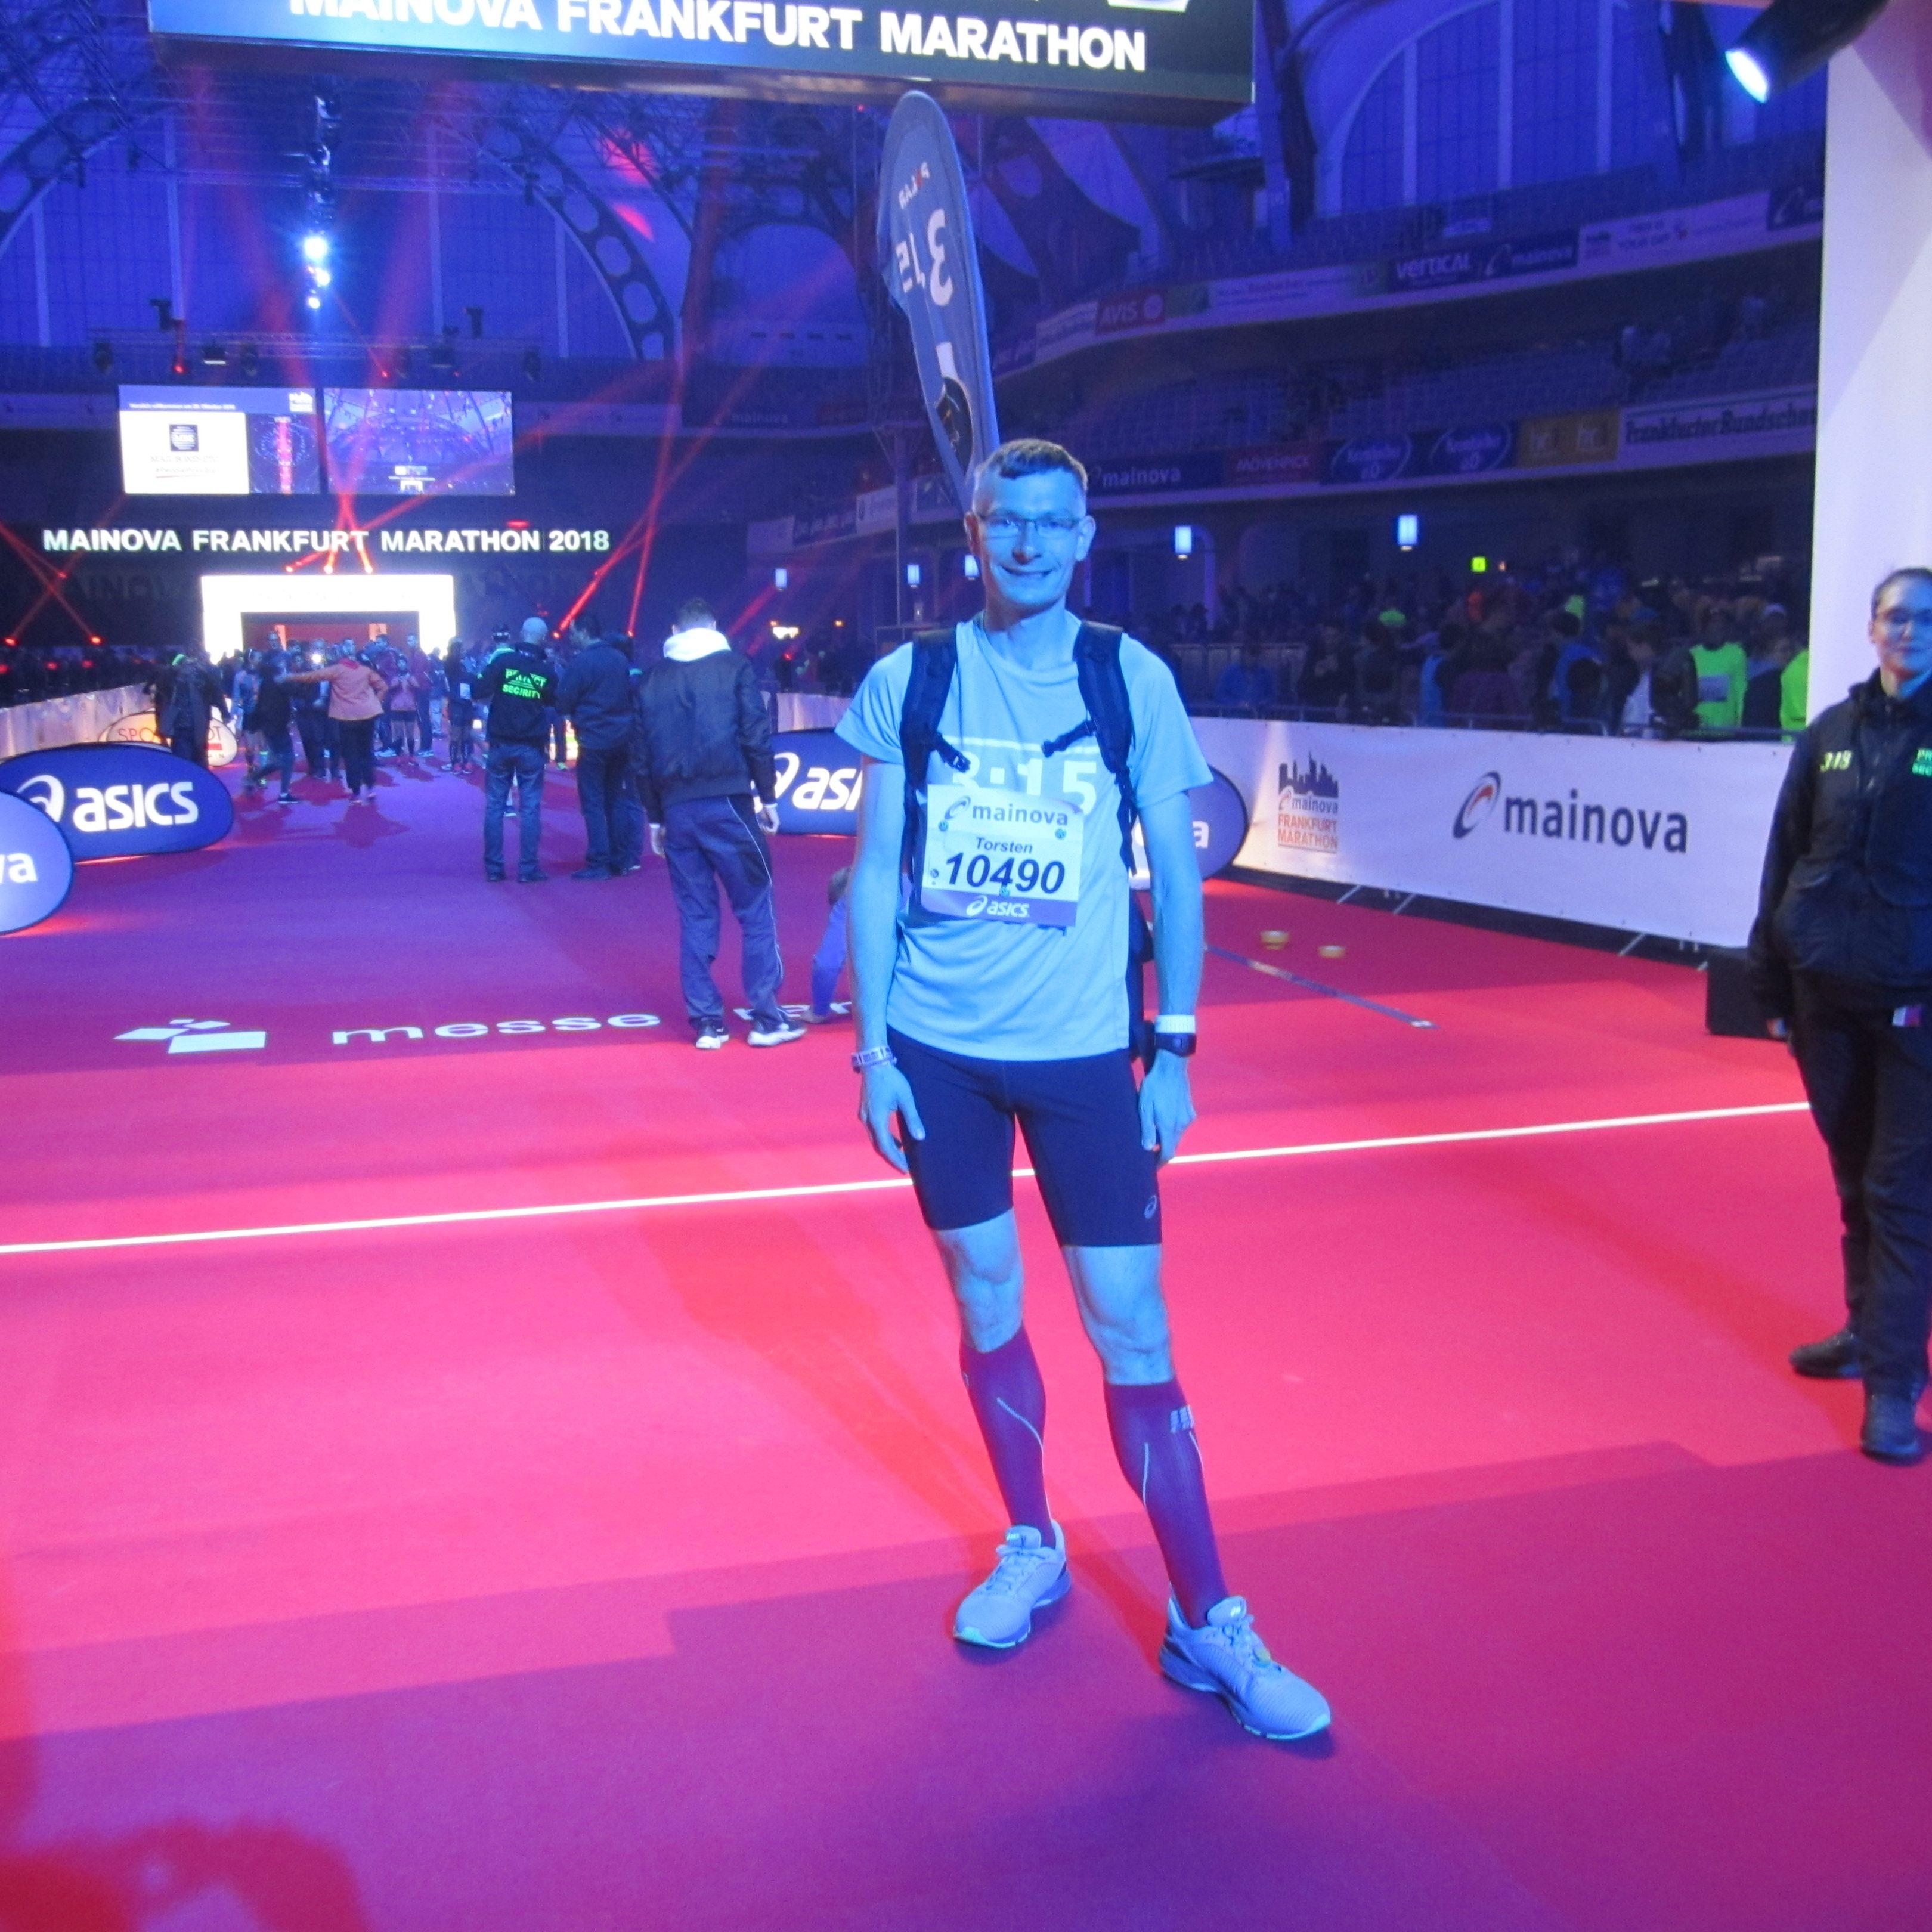 Mainova Frankfurt Marathon Pacemaker Torsten Freese 2019 22